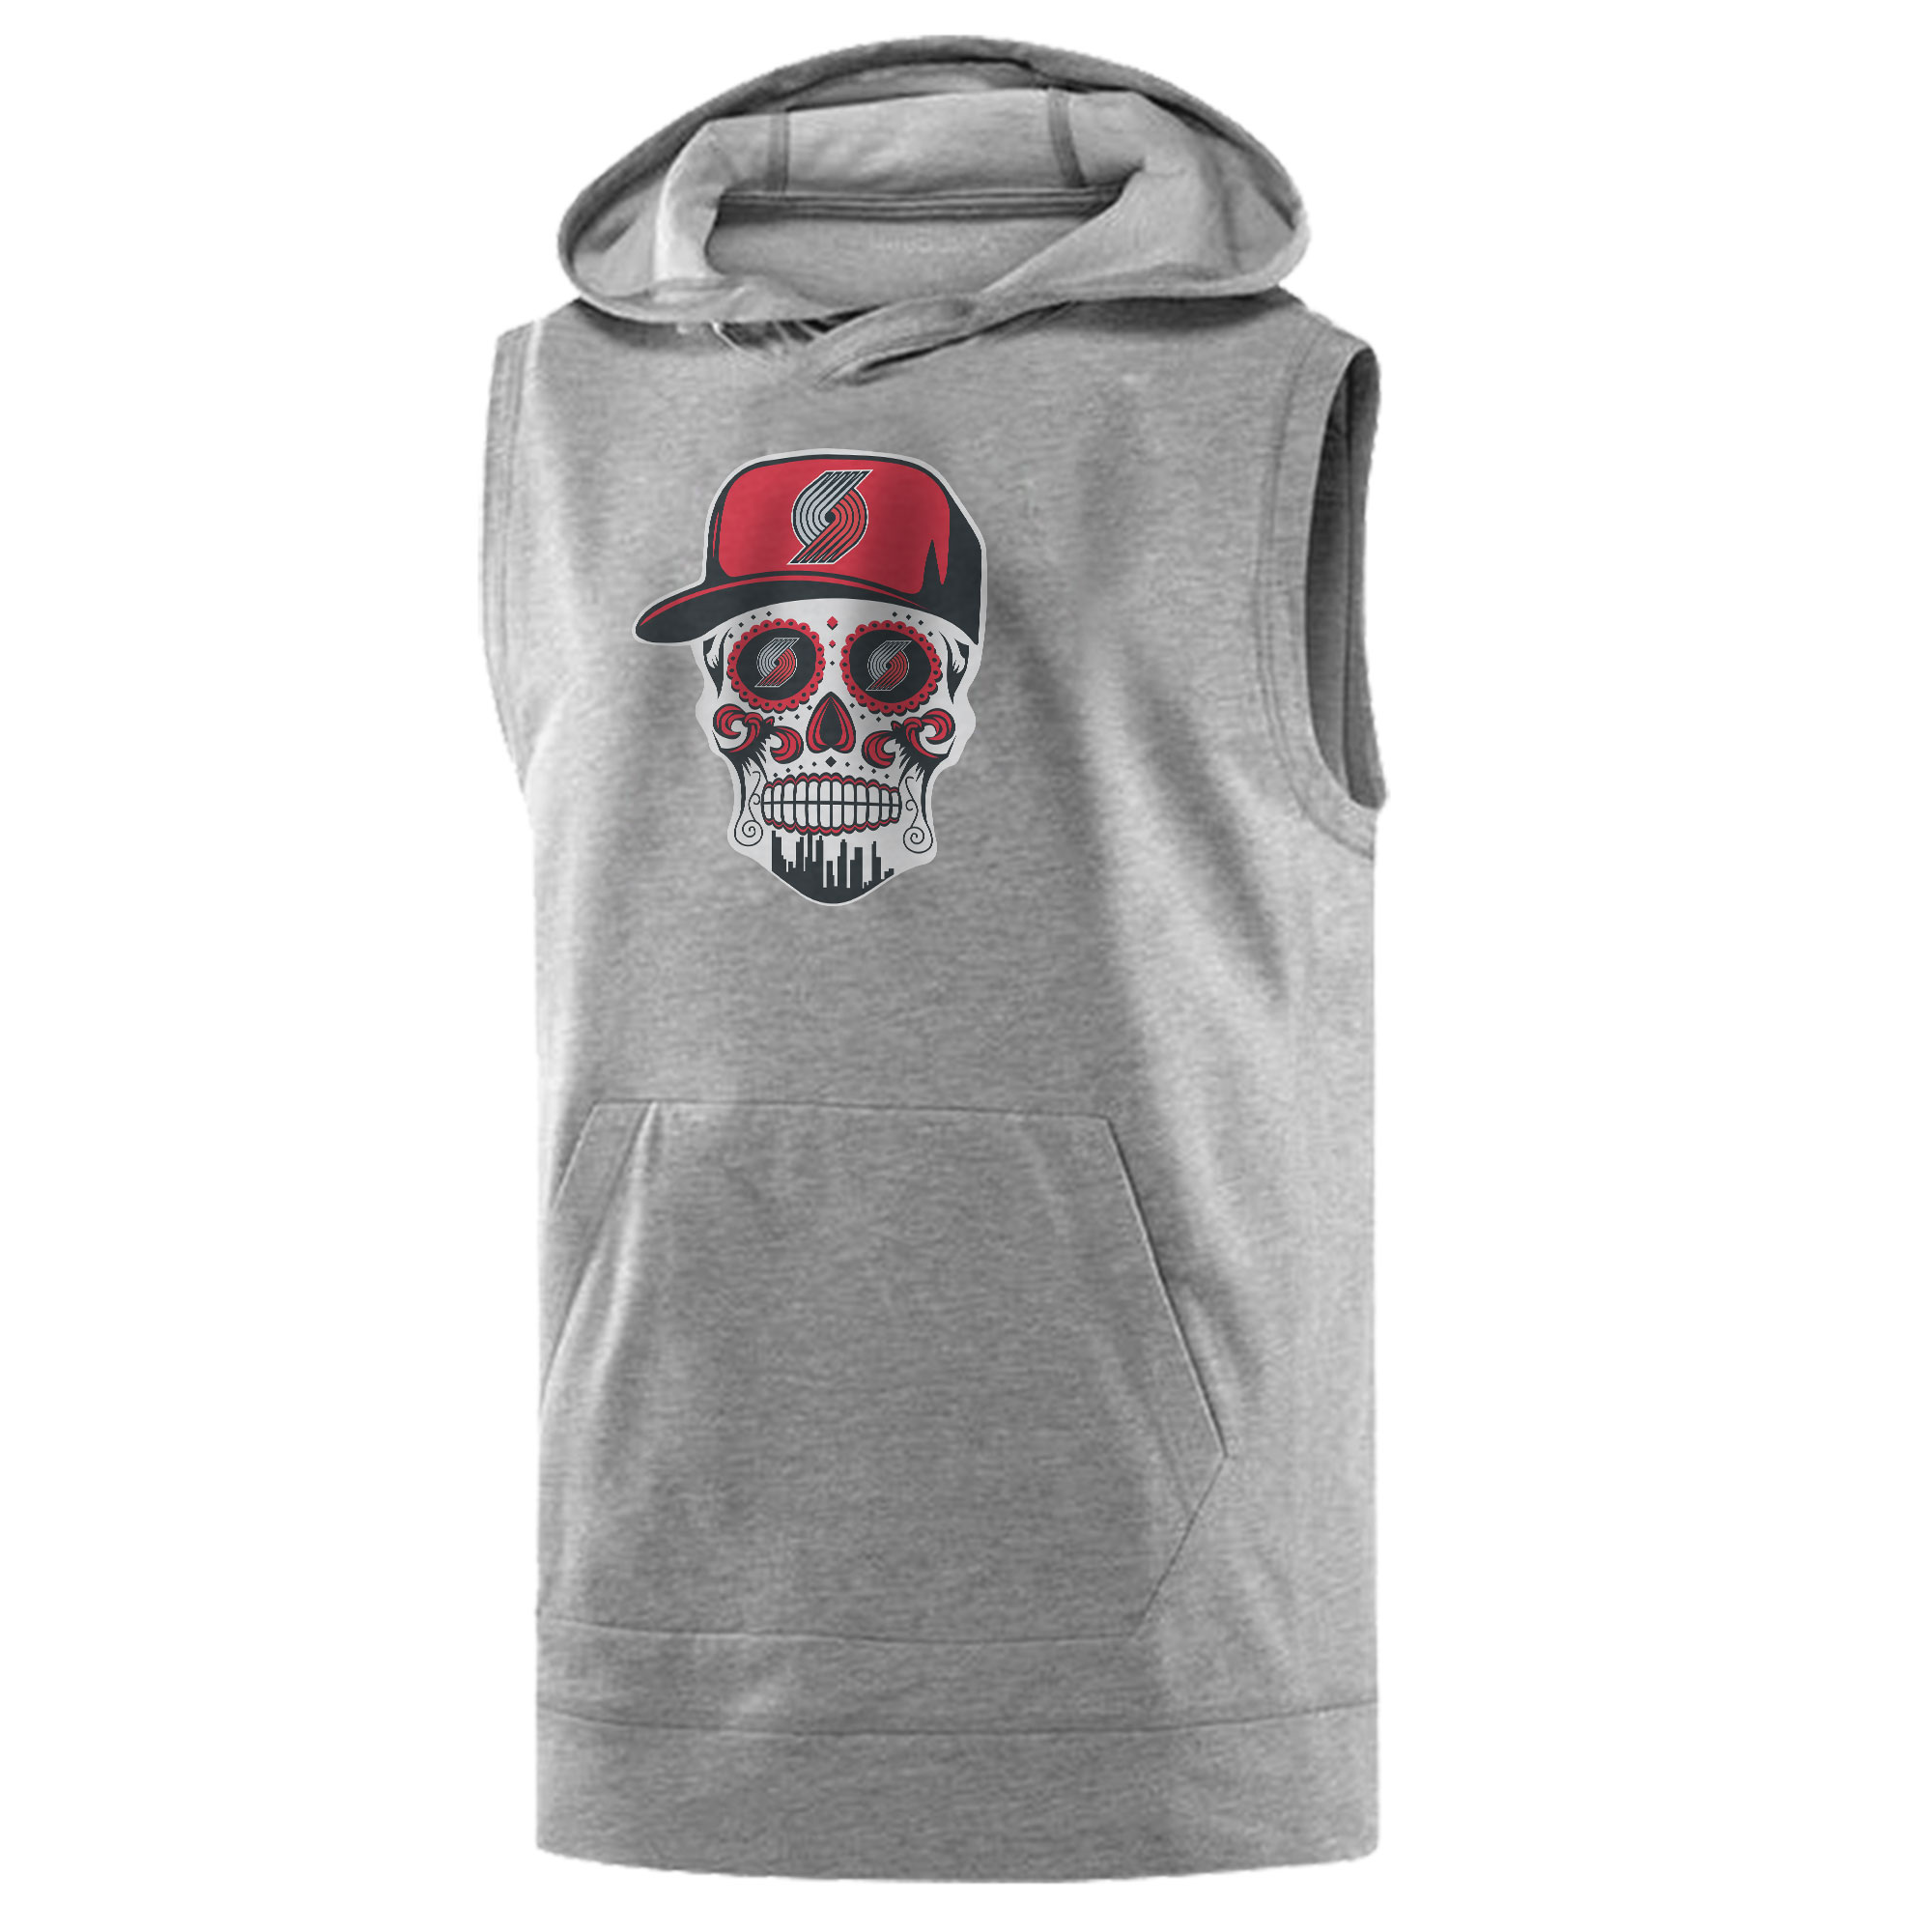 Portland Skull Sleeveless (KLS-GRY-NP-462-NBA.POR.SKULL)